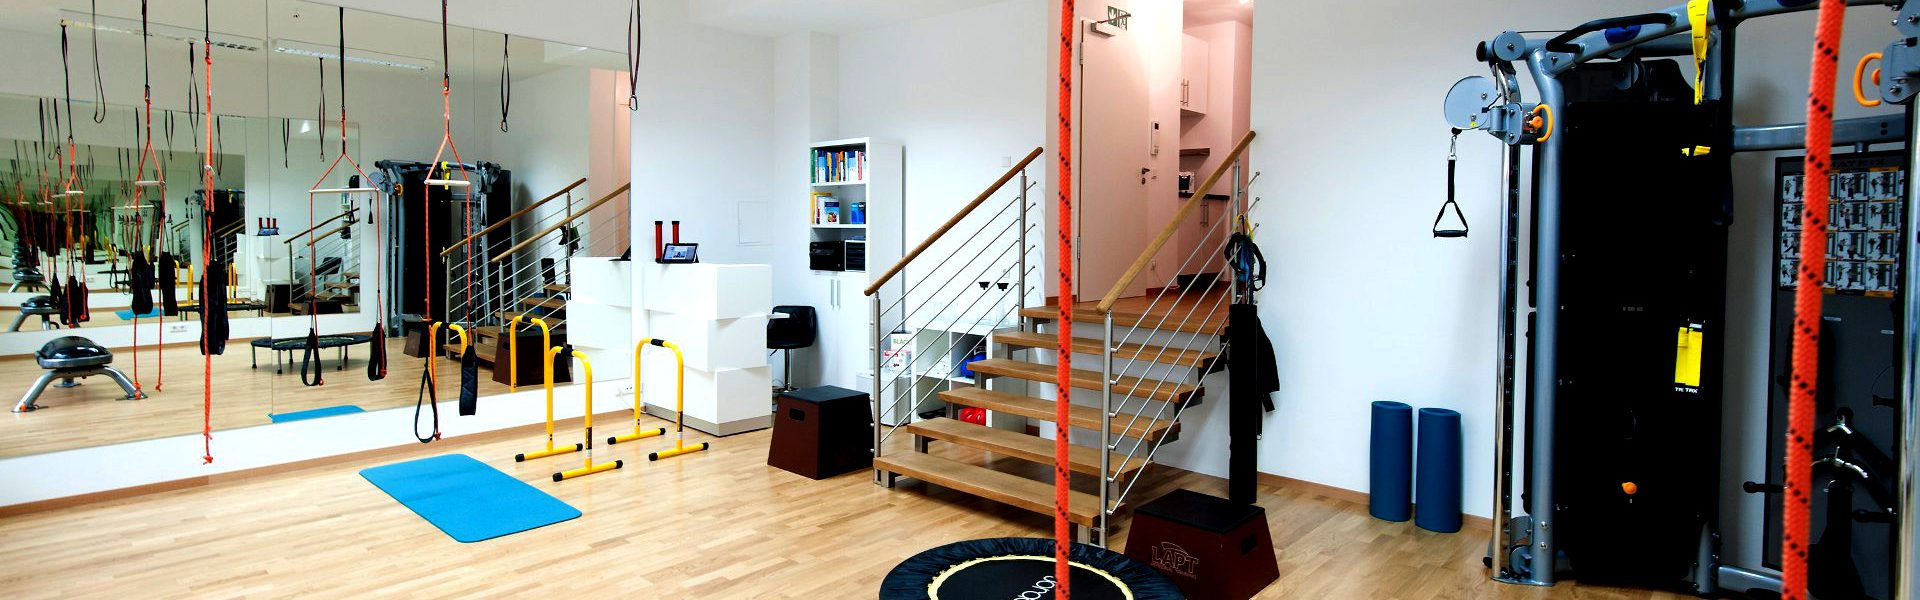 Personal Training Studio Bi PHiT Rumfordstraße - Innenansicht 02